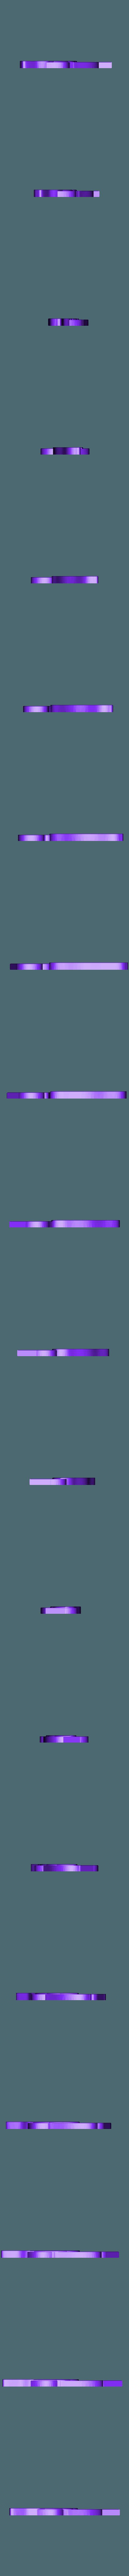 garza.STL Download STL file Key ring Garza • Template to 3D print, deyson20